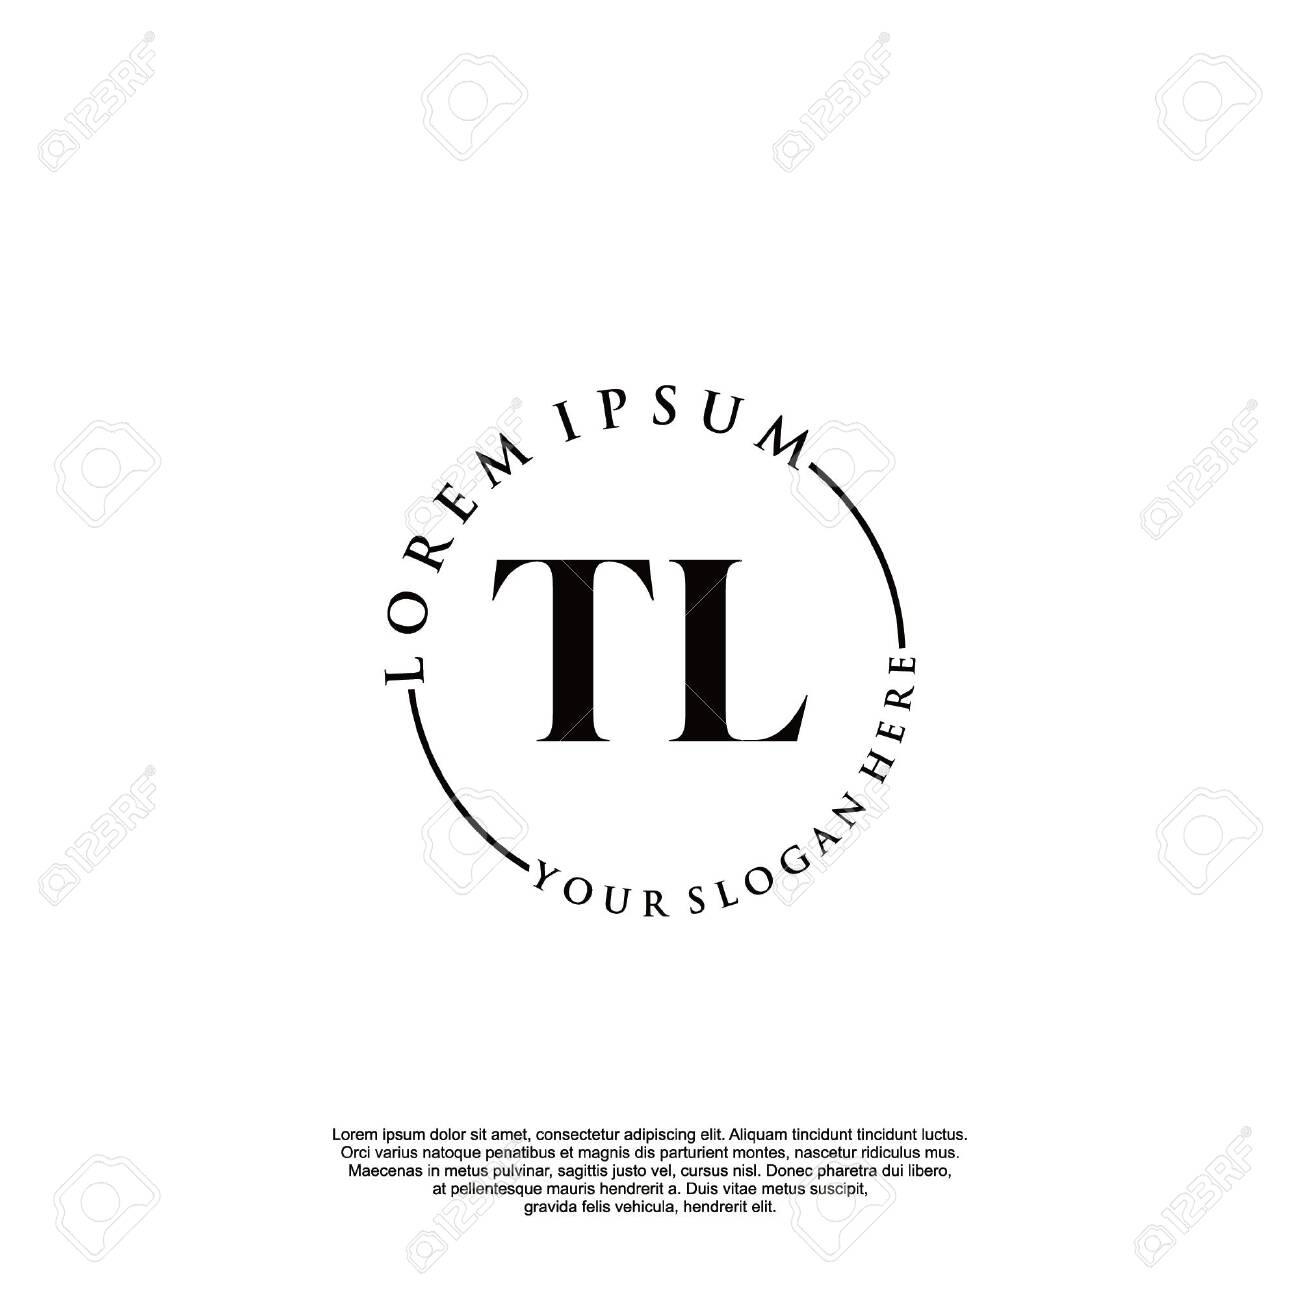 Initial luxury design logo for fashion and wedding. - 148256960